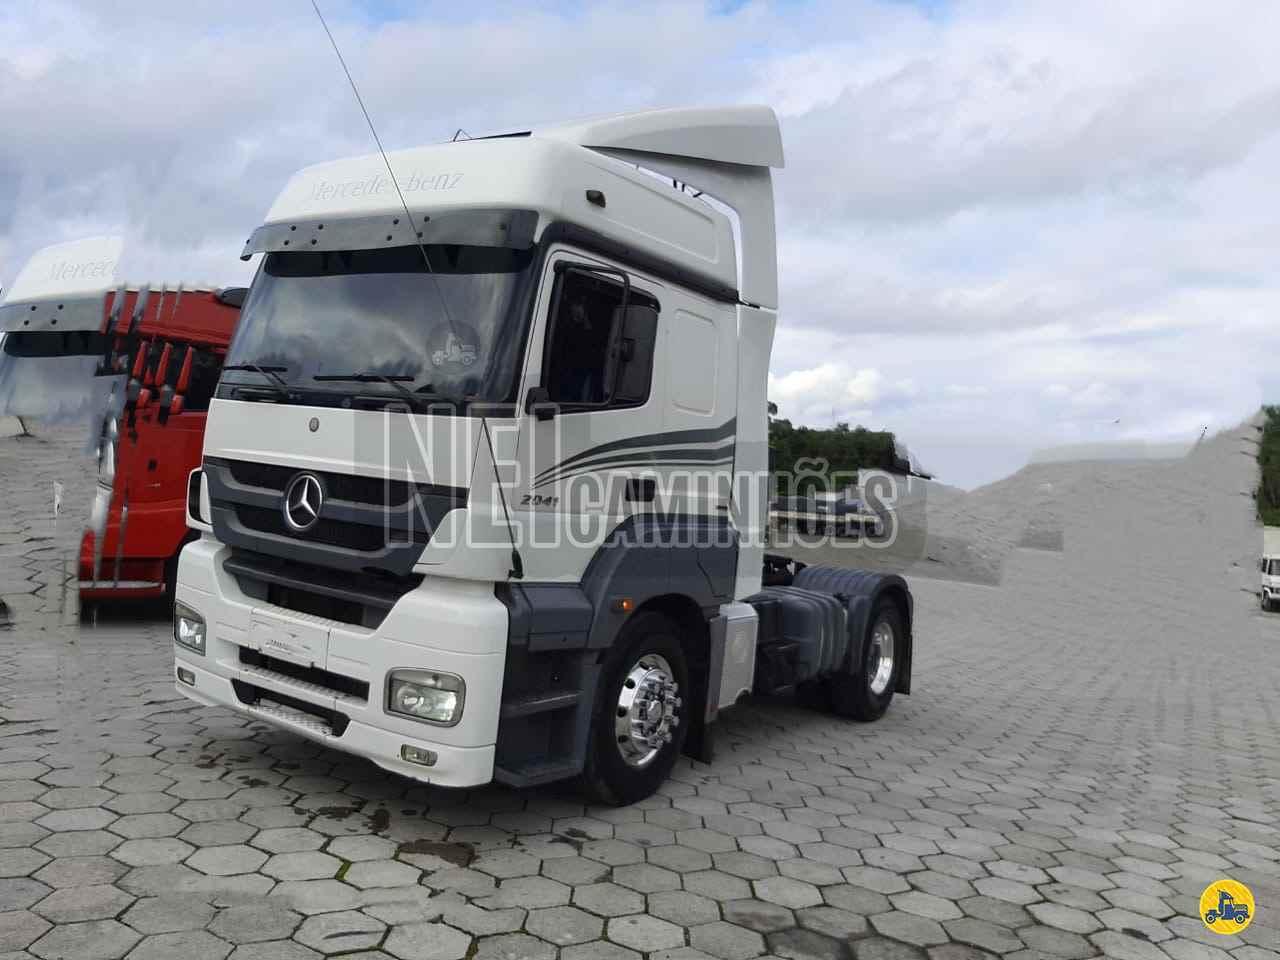 MB 2041 de Nei Caminhões - ITAJAI/SC